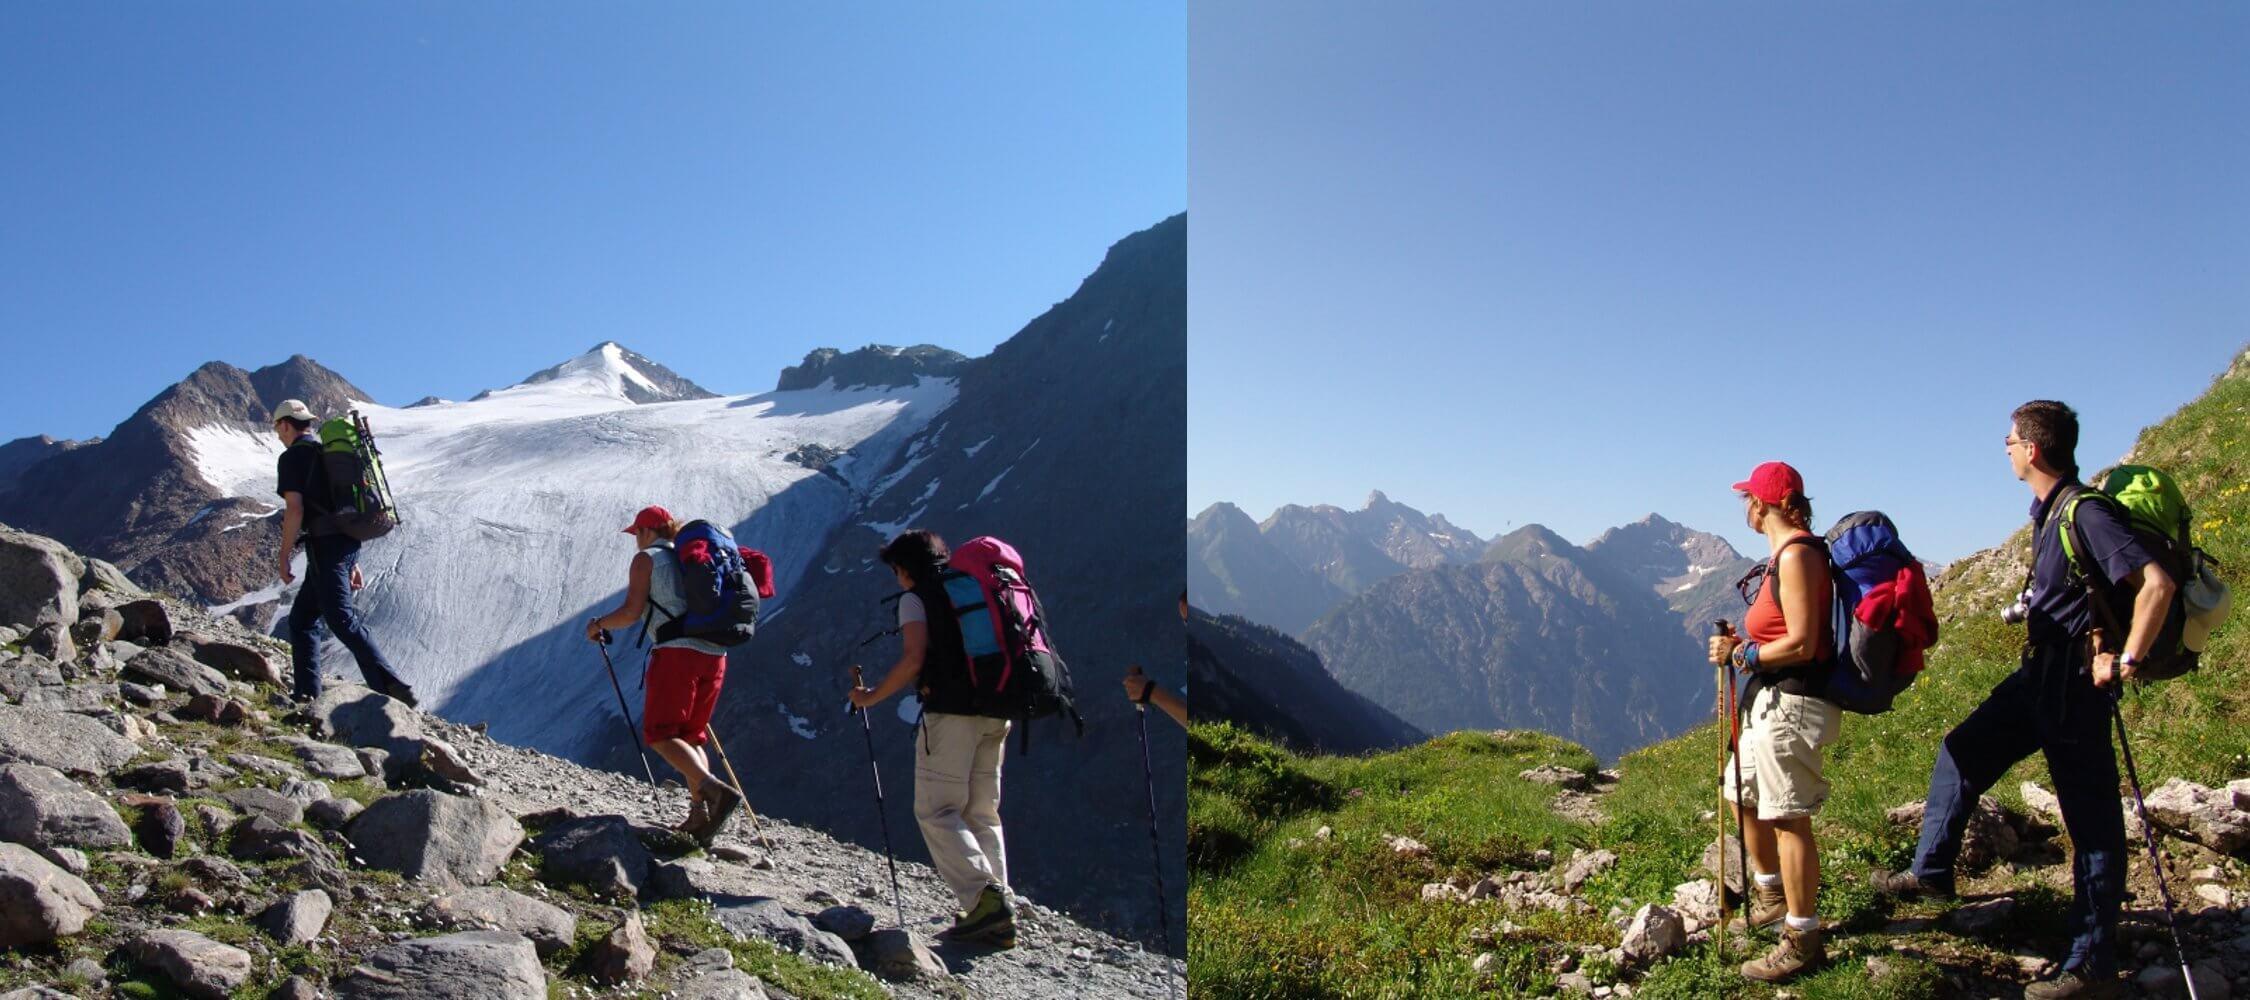 Italien-Trentino_Suedtirol_Alto_Adige_Merano_Meran_Natur_Sport_Sommer_Wandern_Berg_Alpenueberquerung_GuidersDe_2250x1000